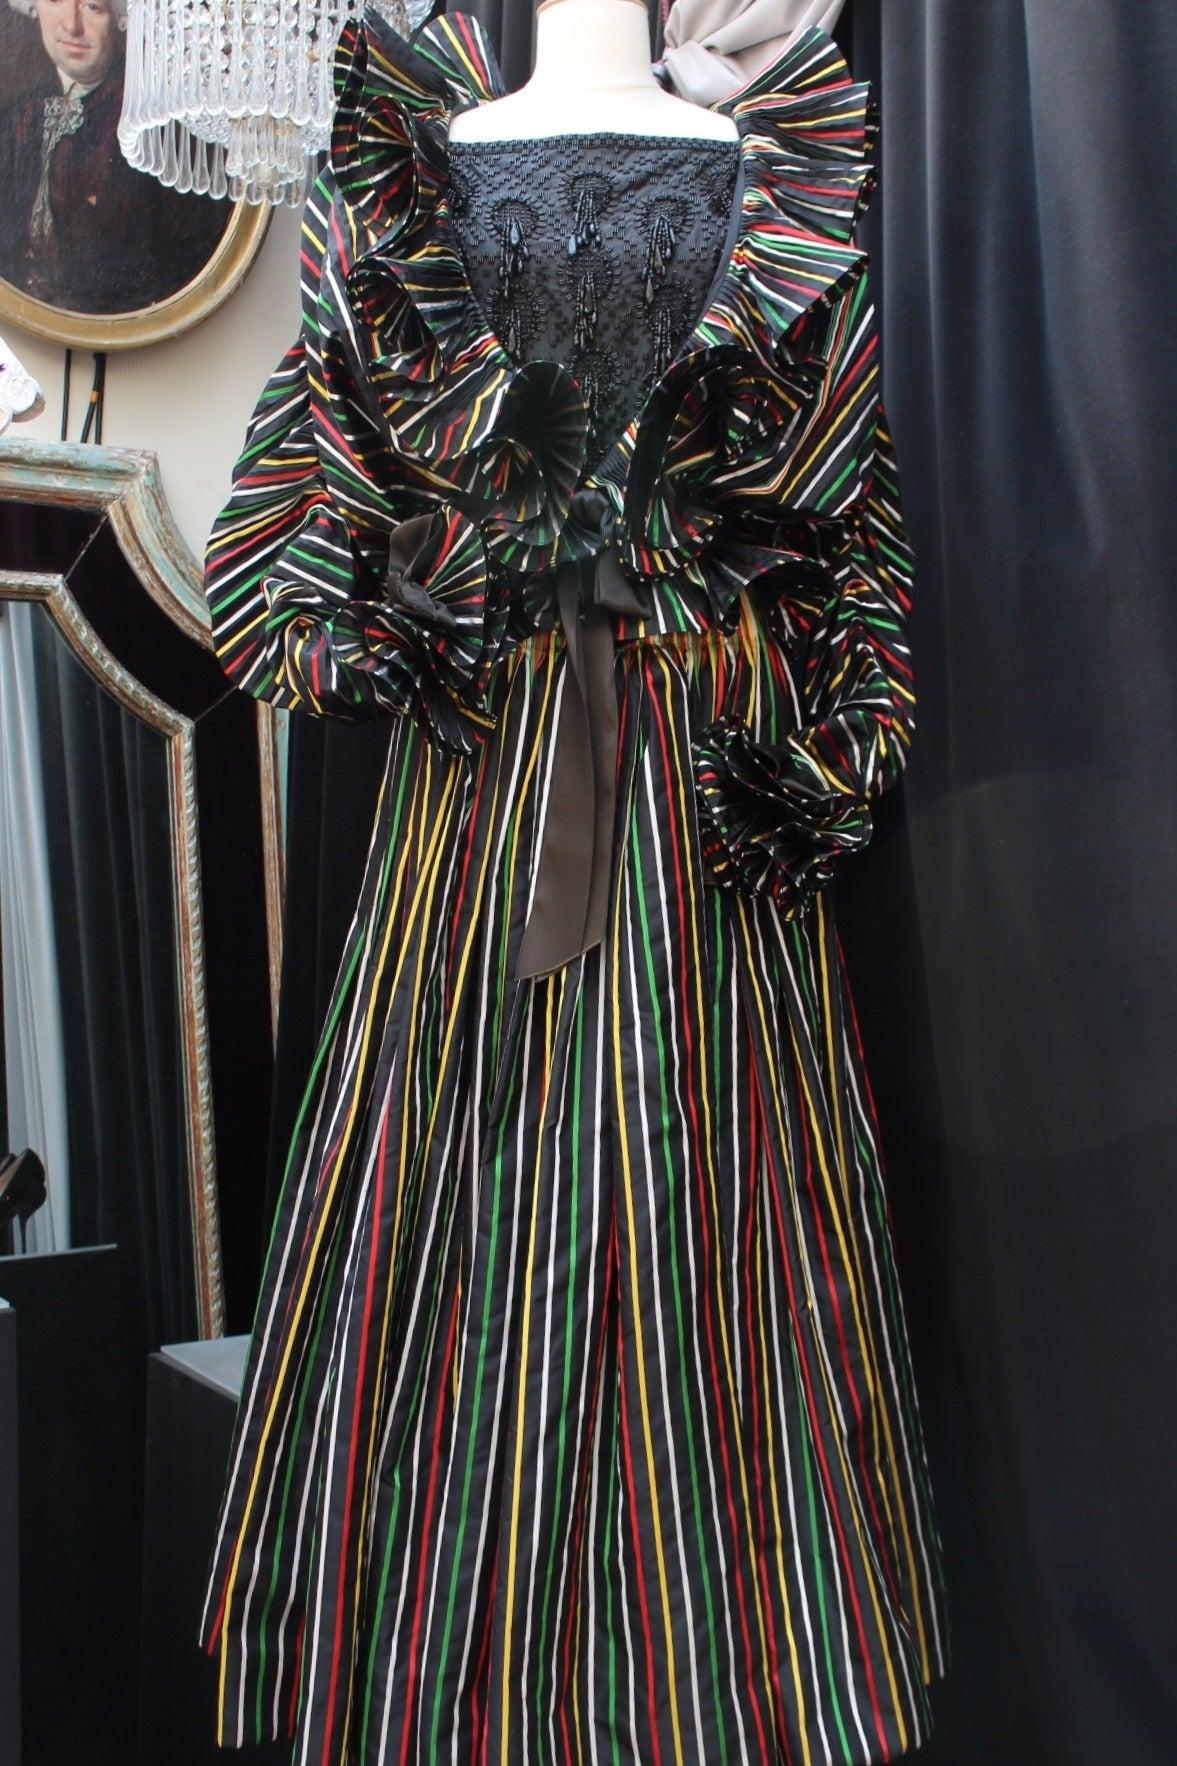 1980er Jahre Nina Ricci Haute Couture Gestreiftes Schwarzes und Buntes Abend Ensemble 2